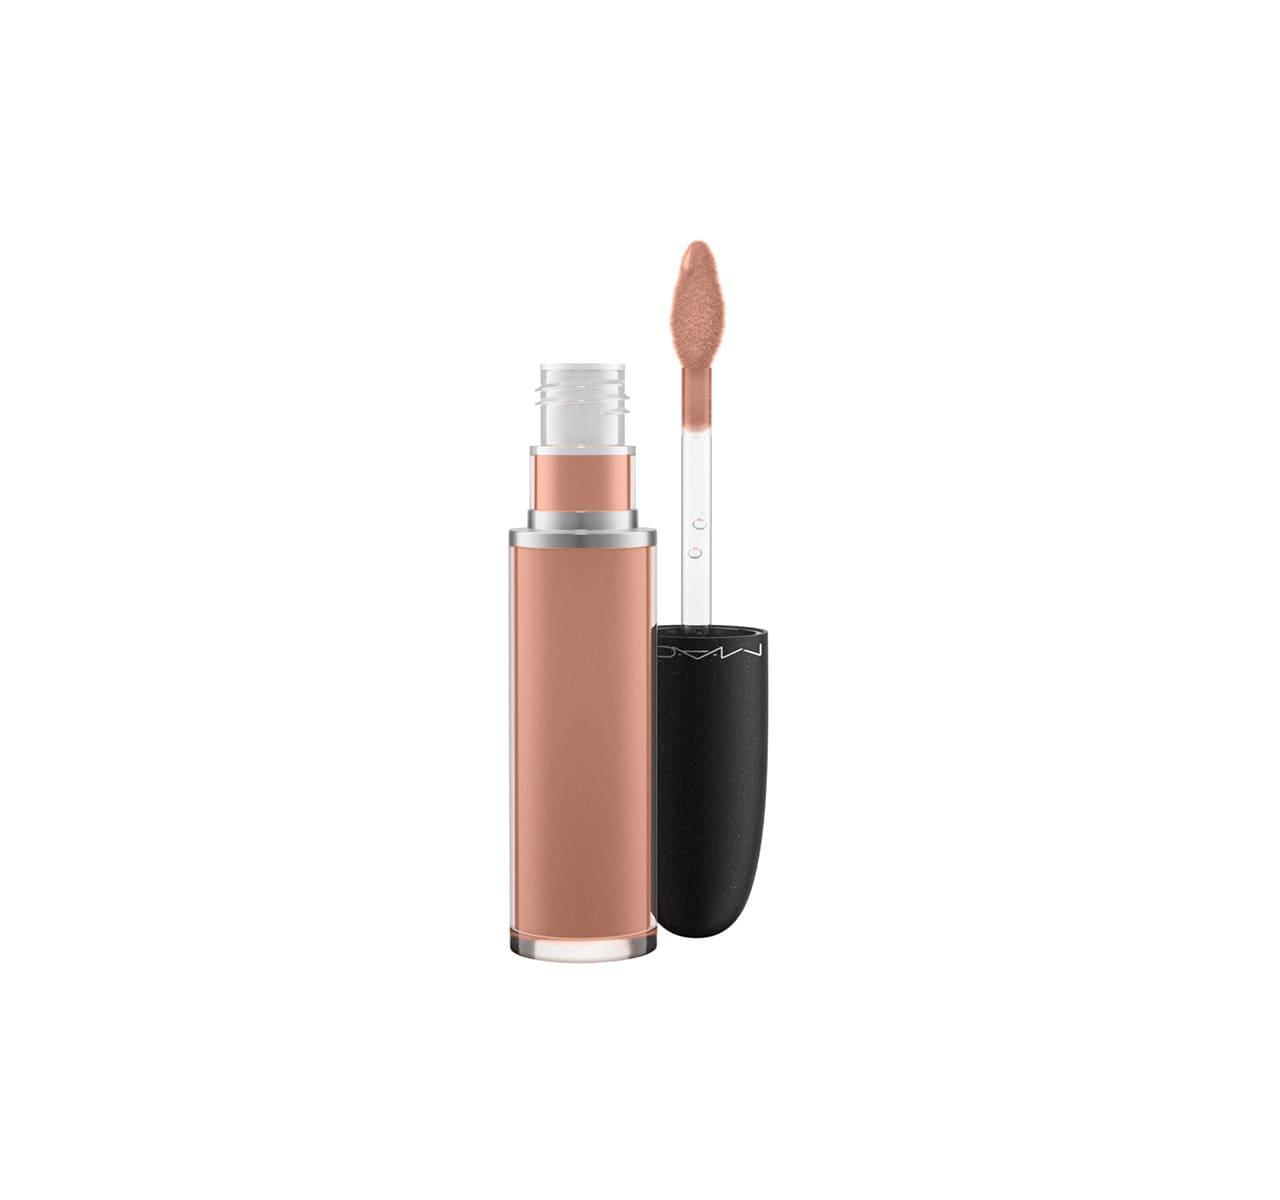 Retro Matte Liquid Lipcolour Mac Cosmetics Official Site